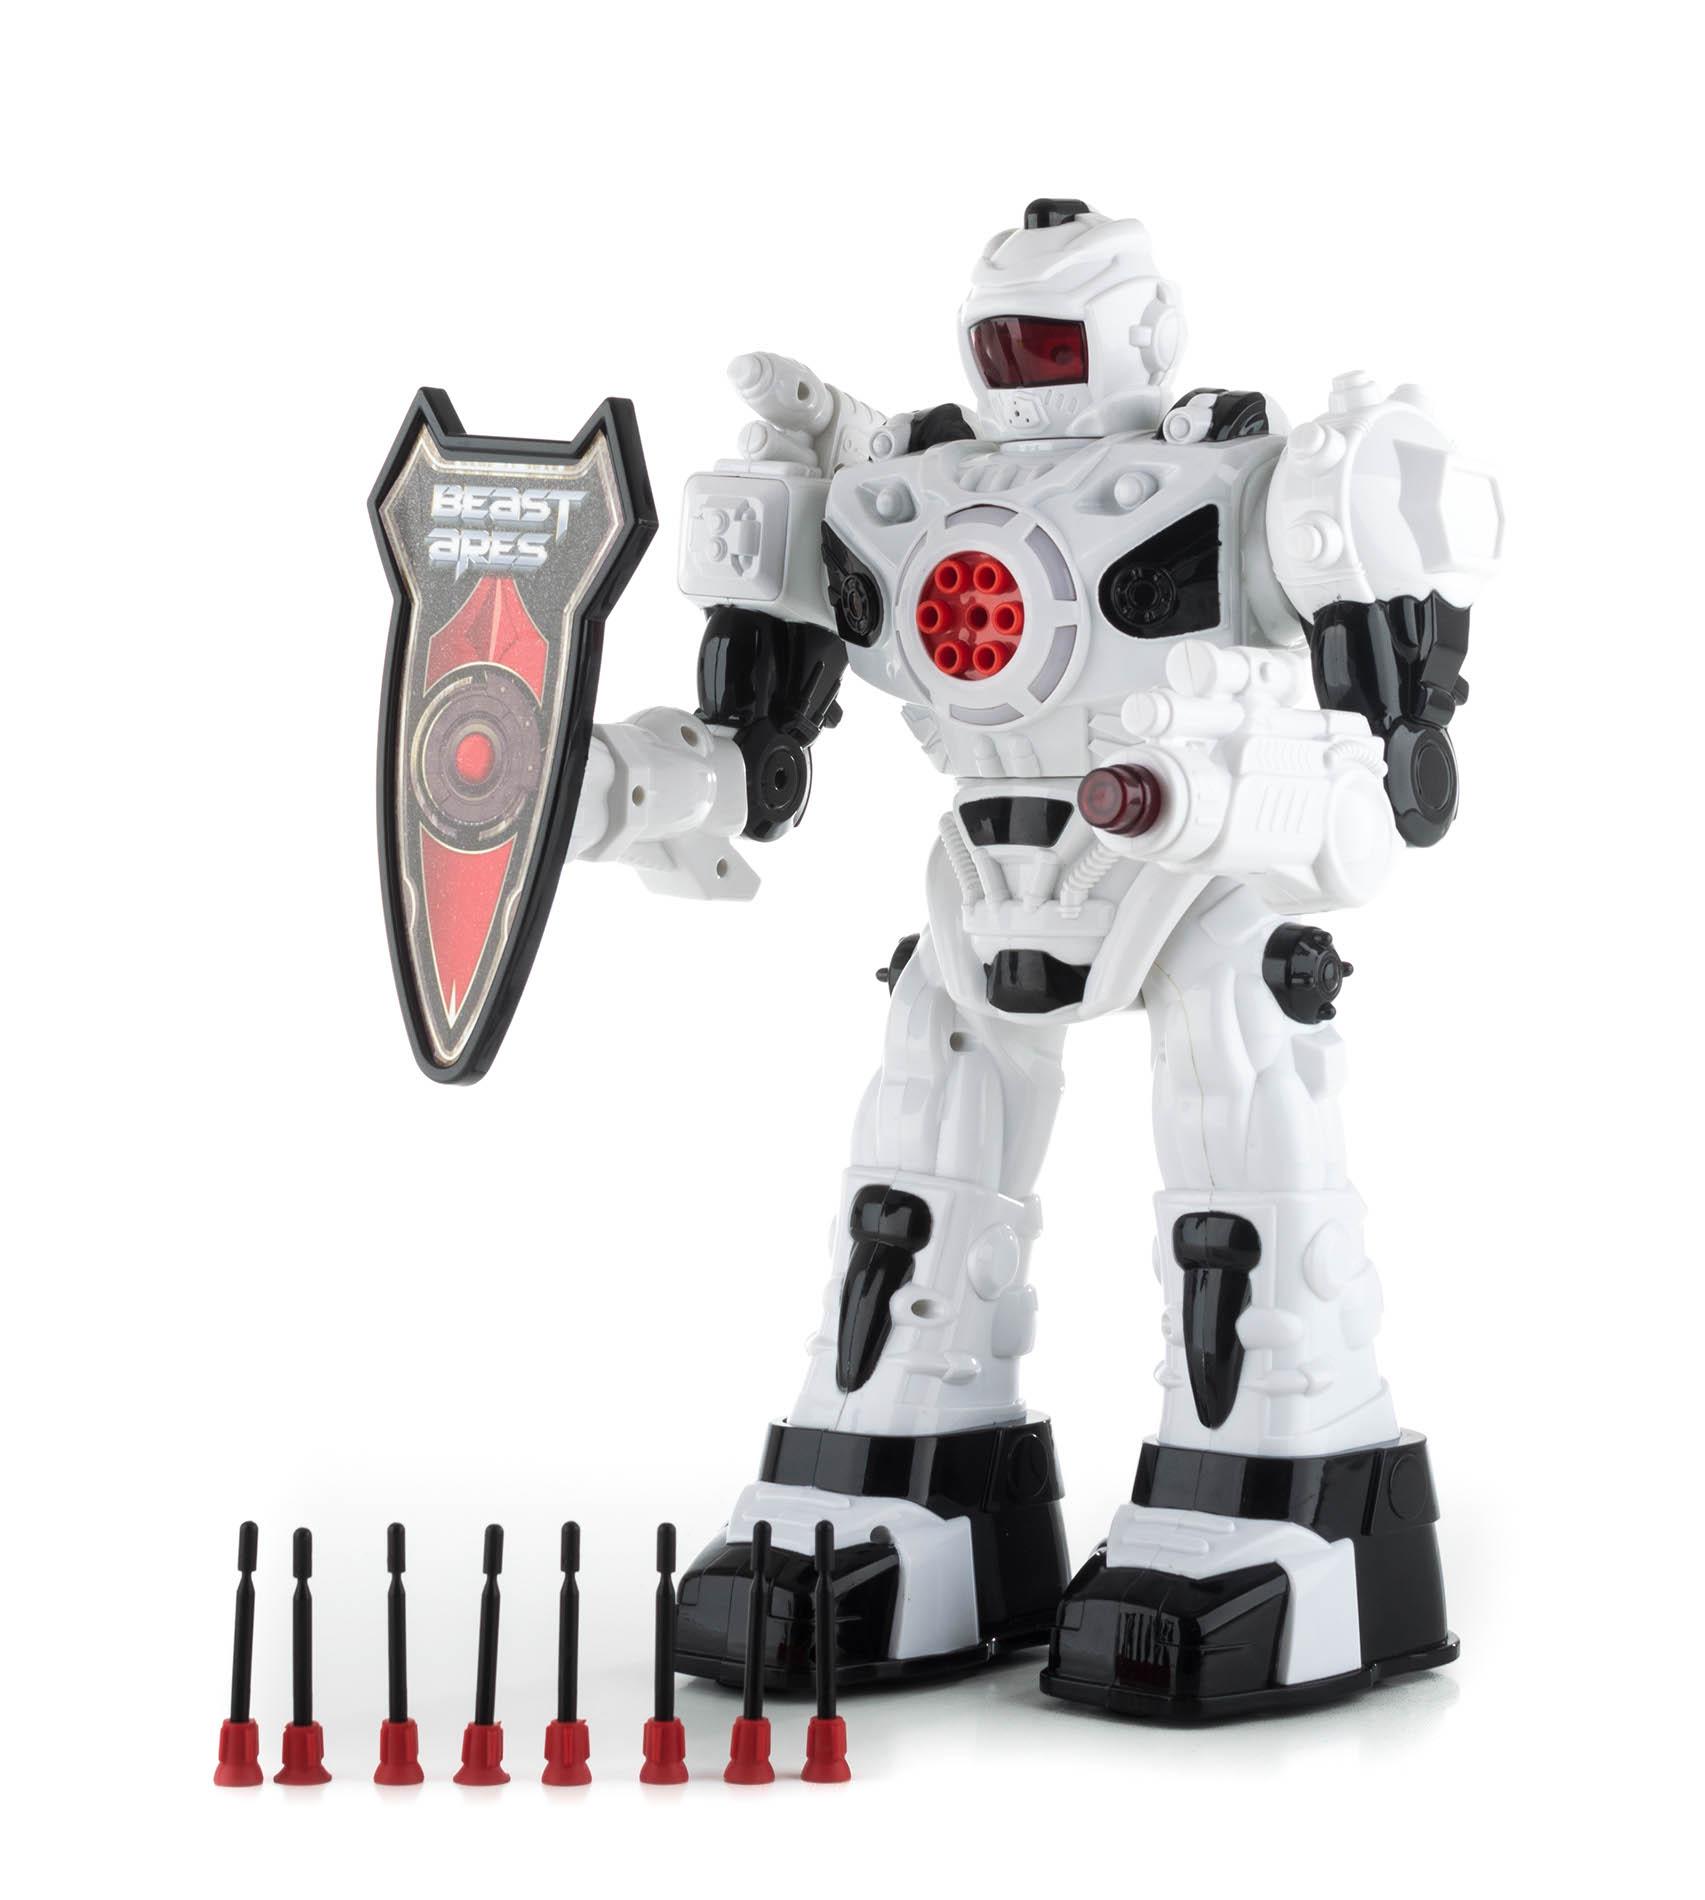 Hračka G21 I/R robot Cyber Cop